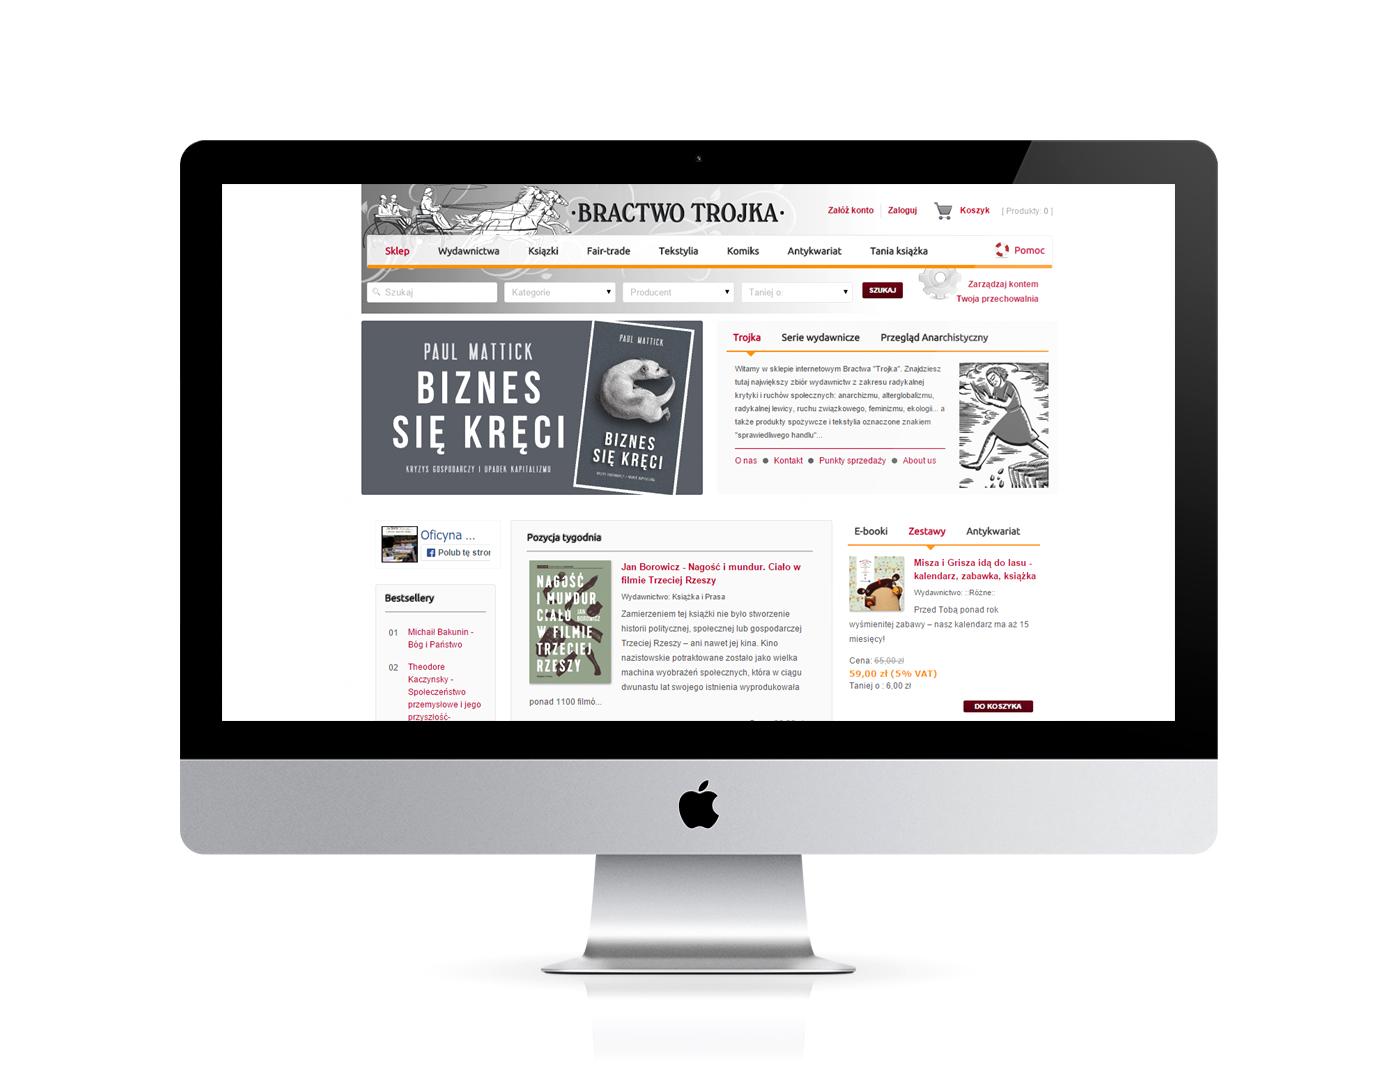 Ksi Garnia Internetowa Bractwa Trojka Trojka Design Pozna